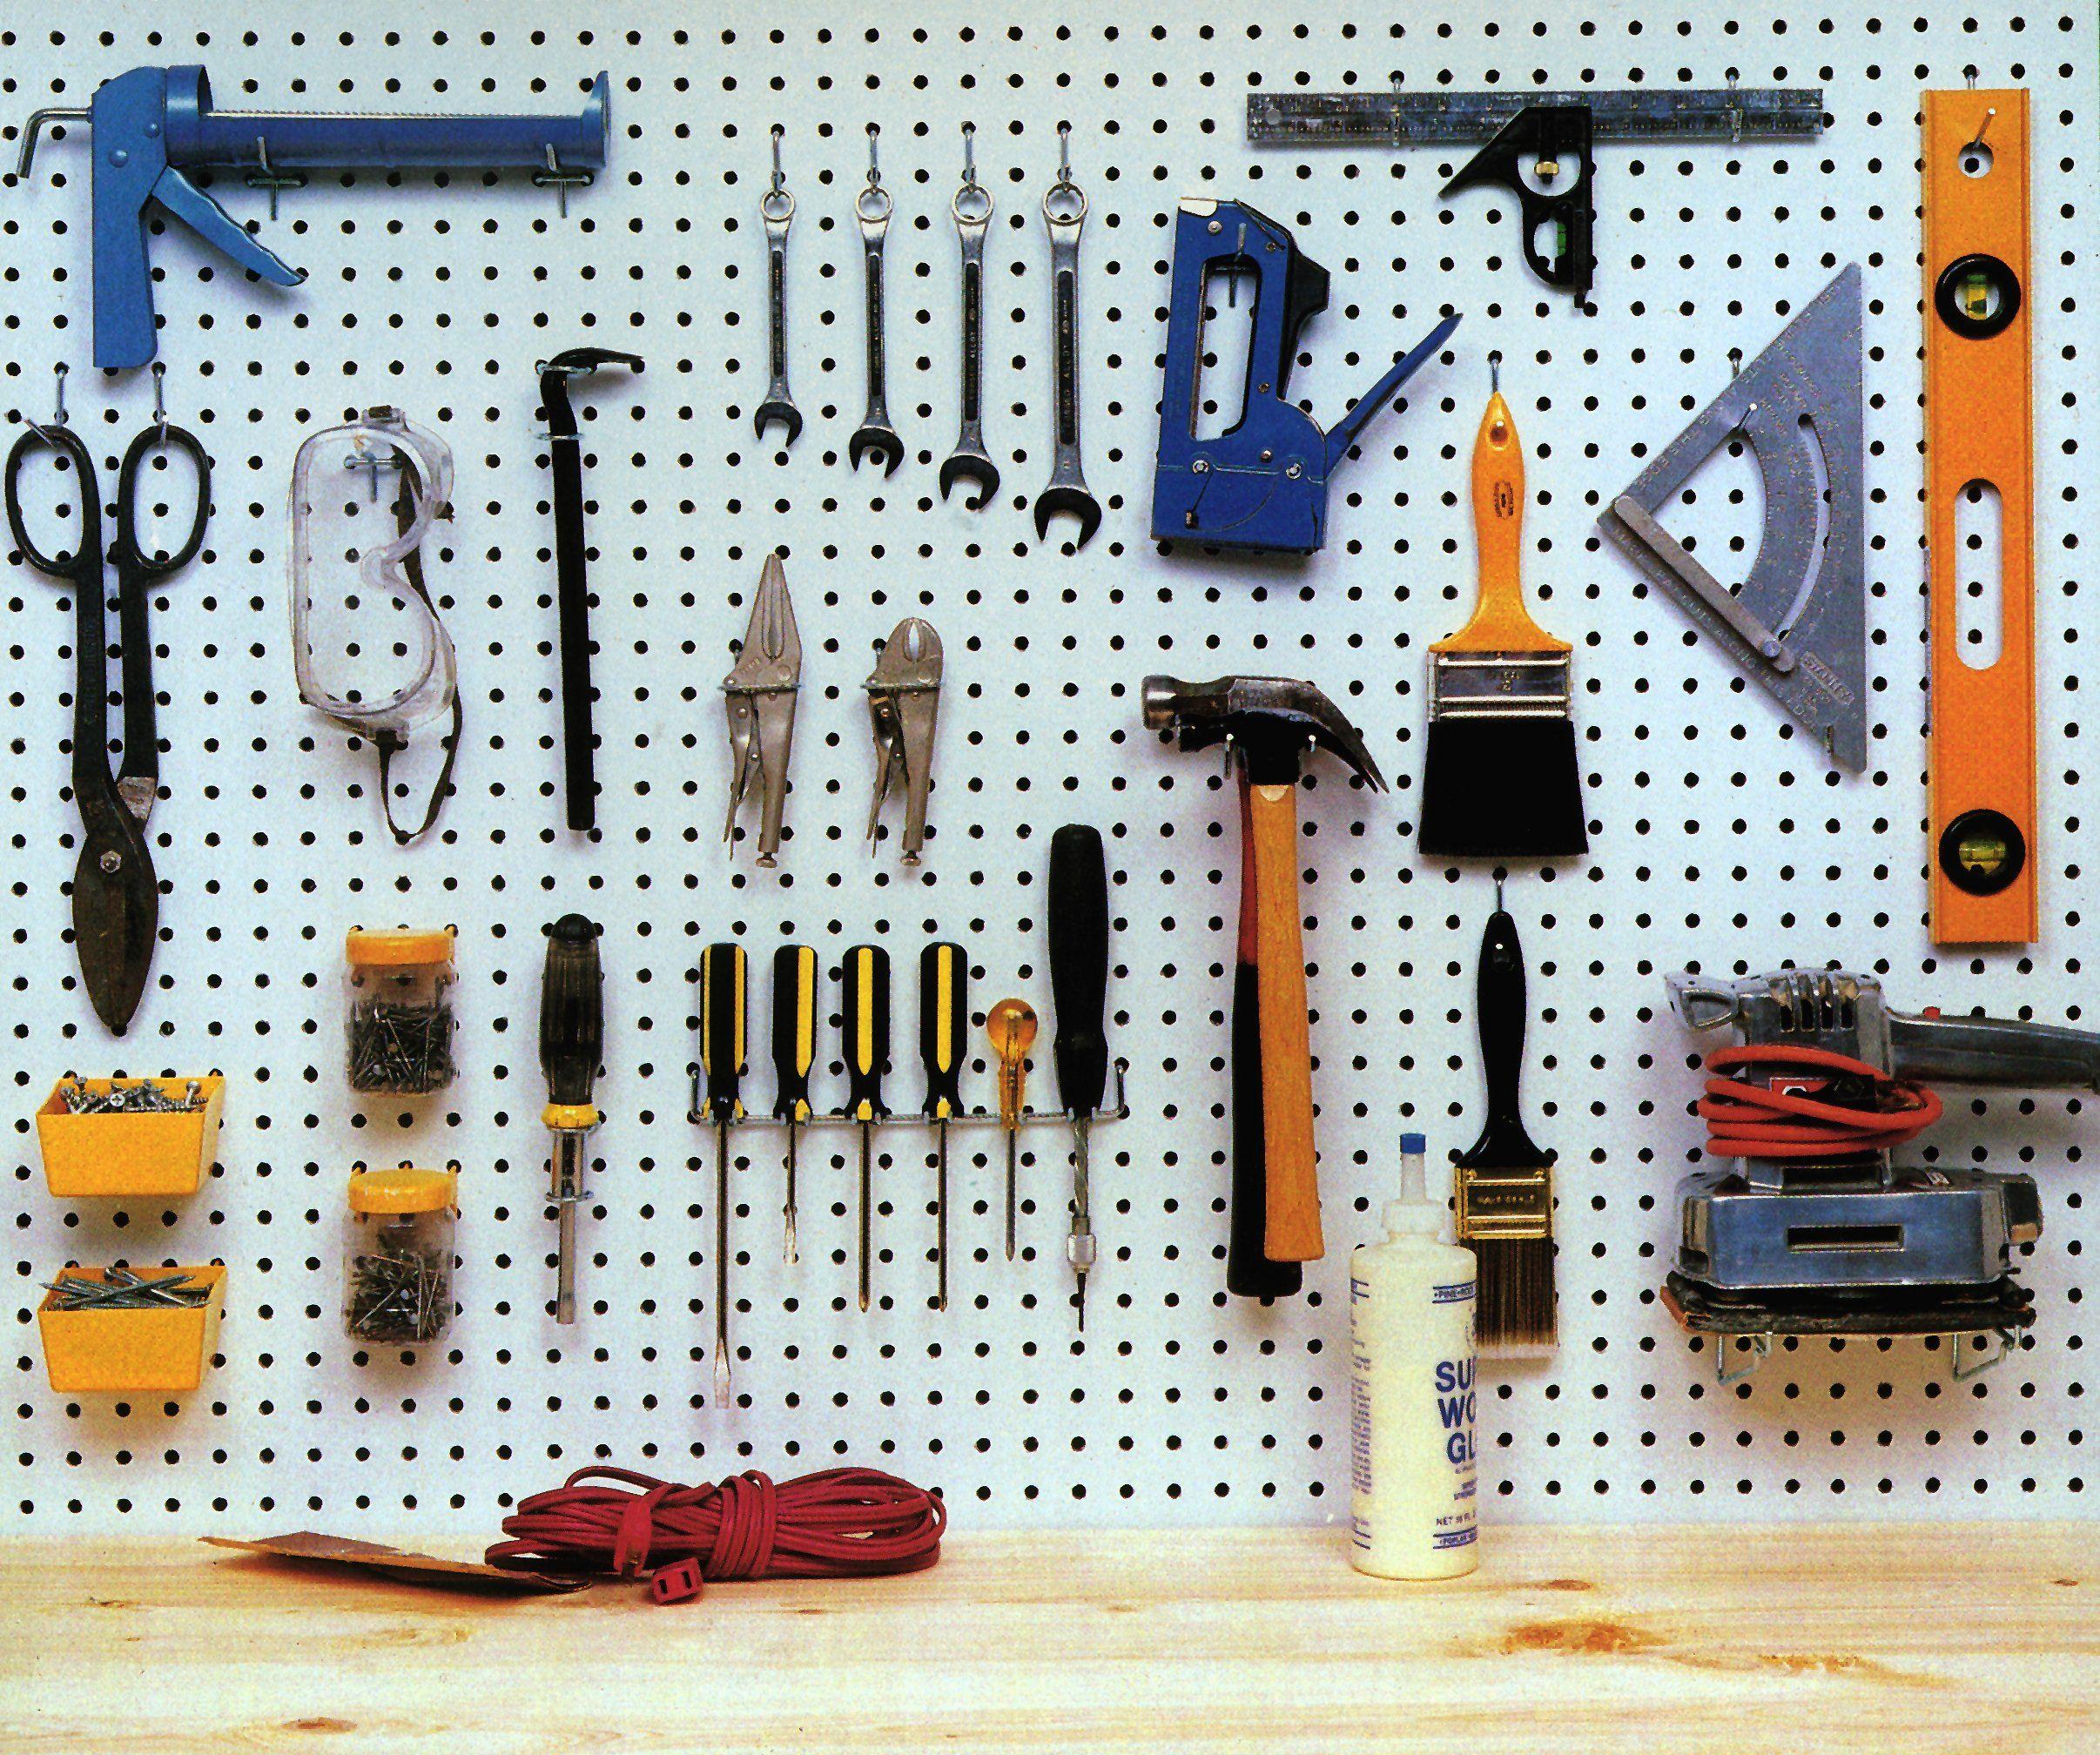 Crawford 1843B Pegboard Organizer, 43-Piece | AmazonSupply.com | For ...